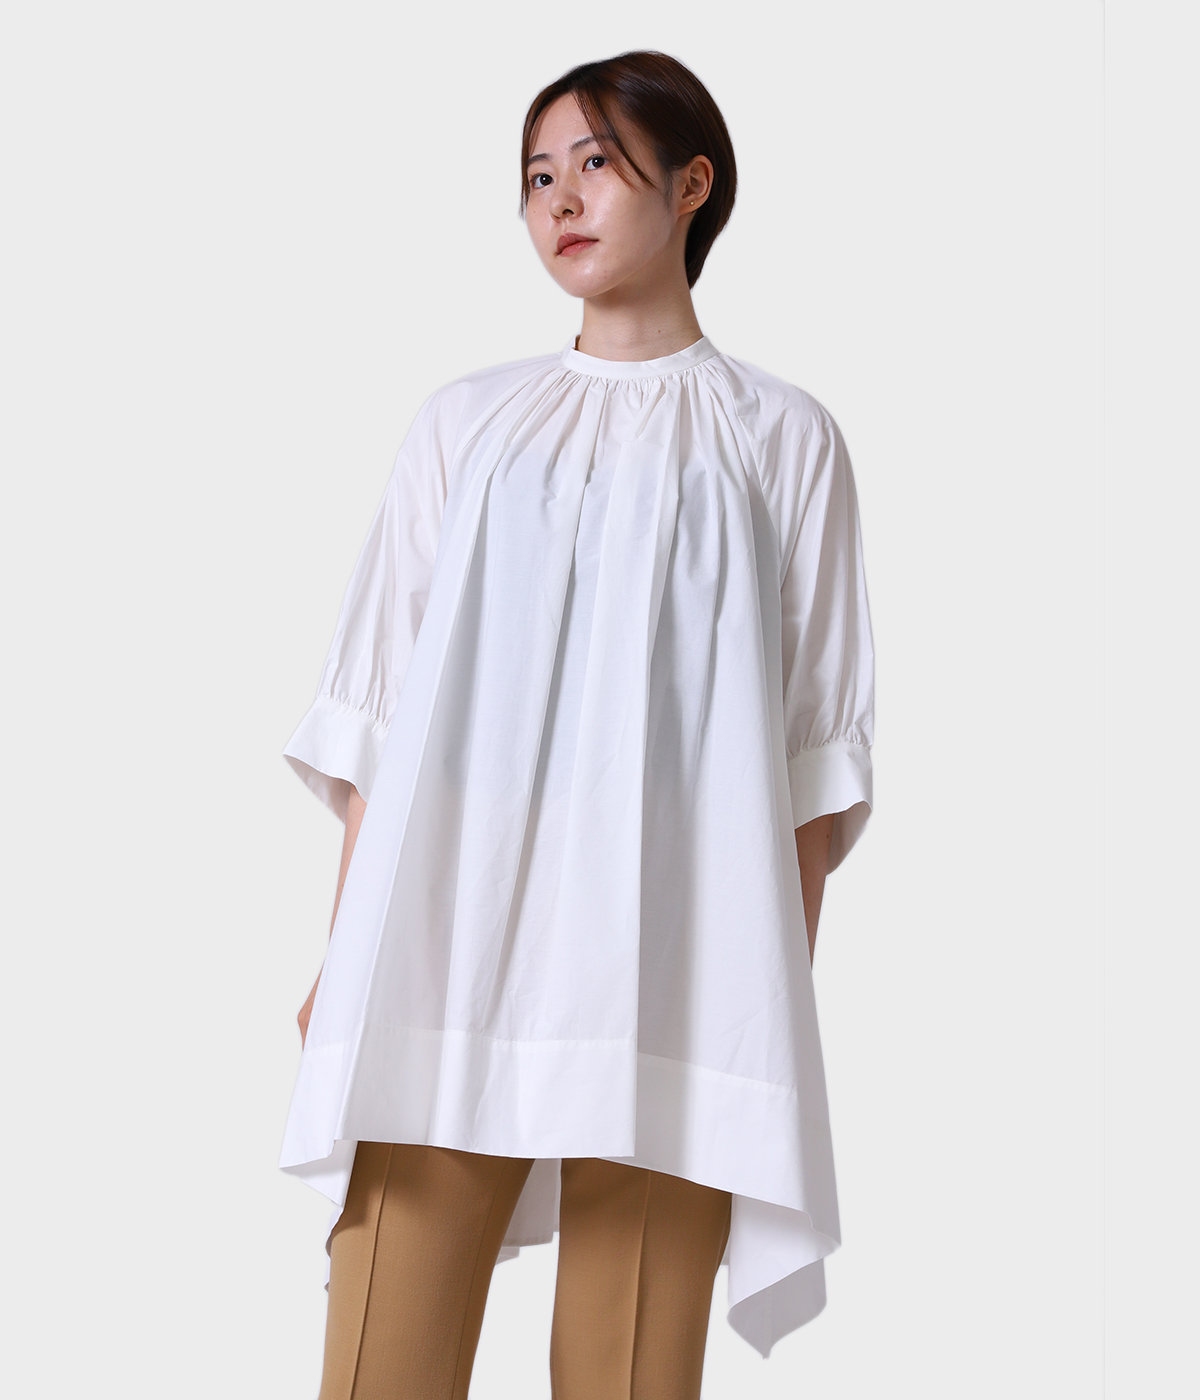 model(169cm) 着用サイズ:1